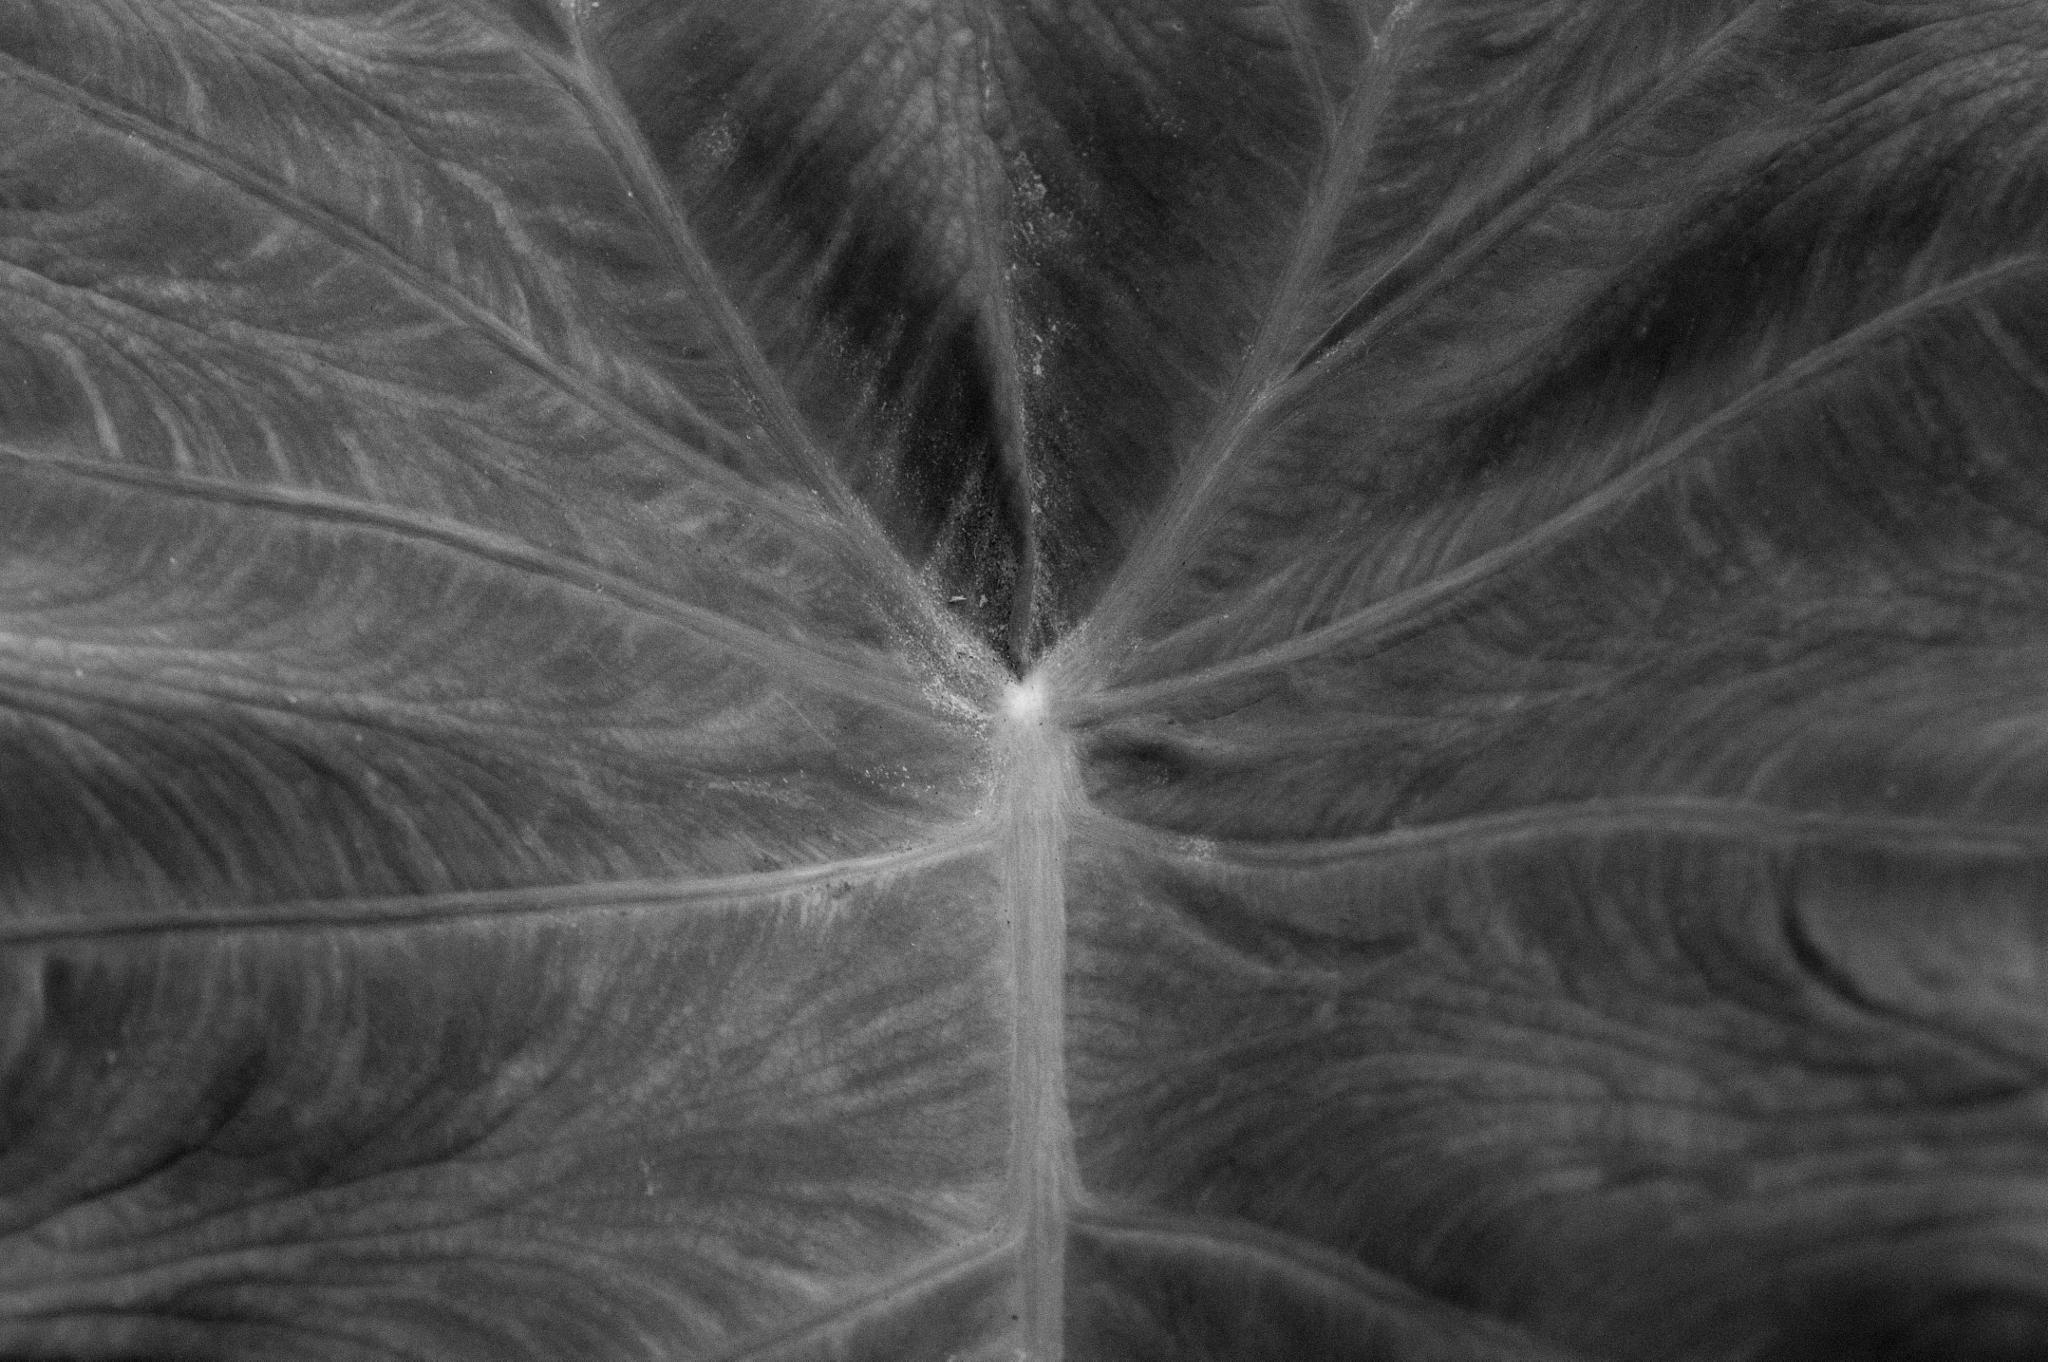 Leaf by jialian.lin